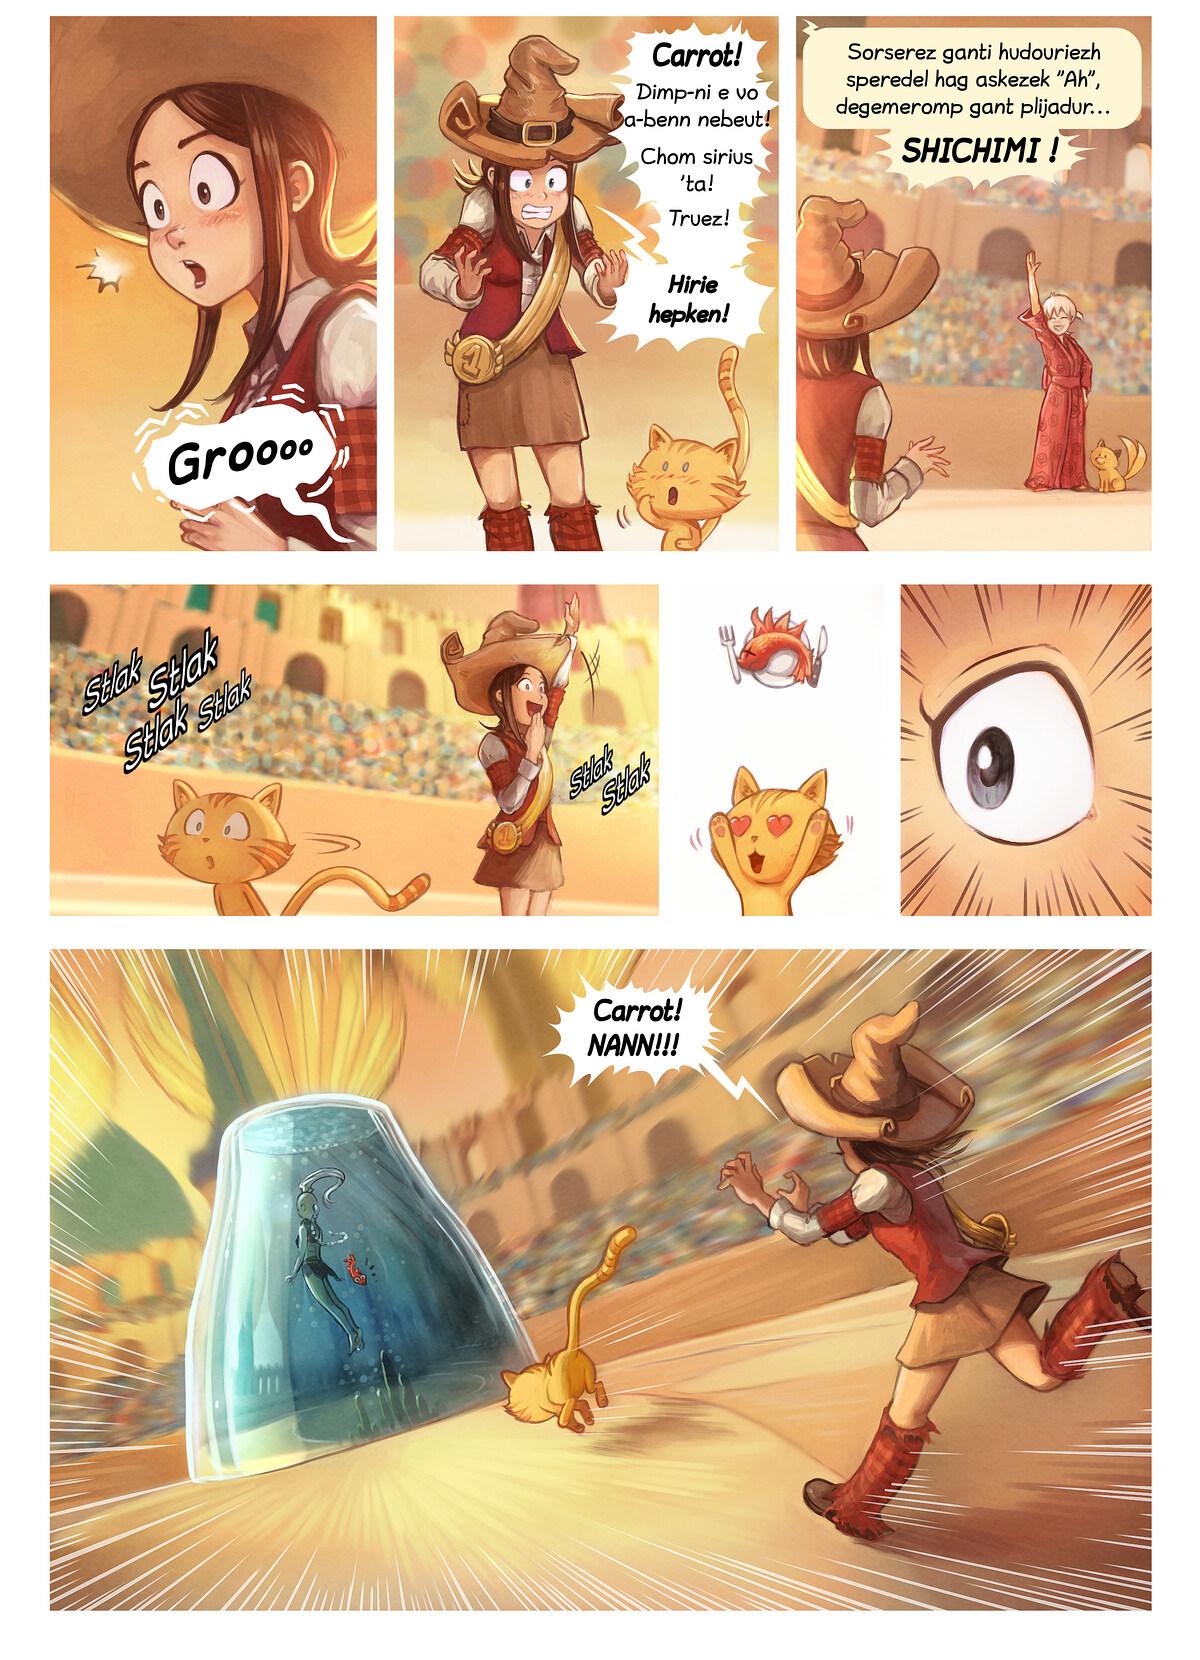 Rann 21: Ar genstrivadeg hudouriezh, Page 5